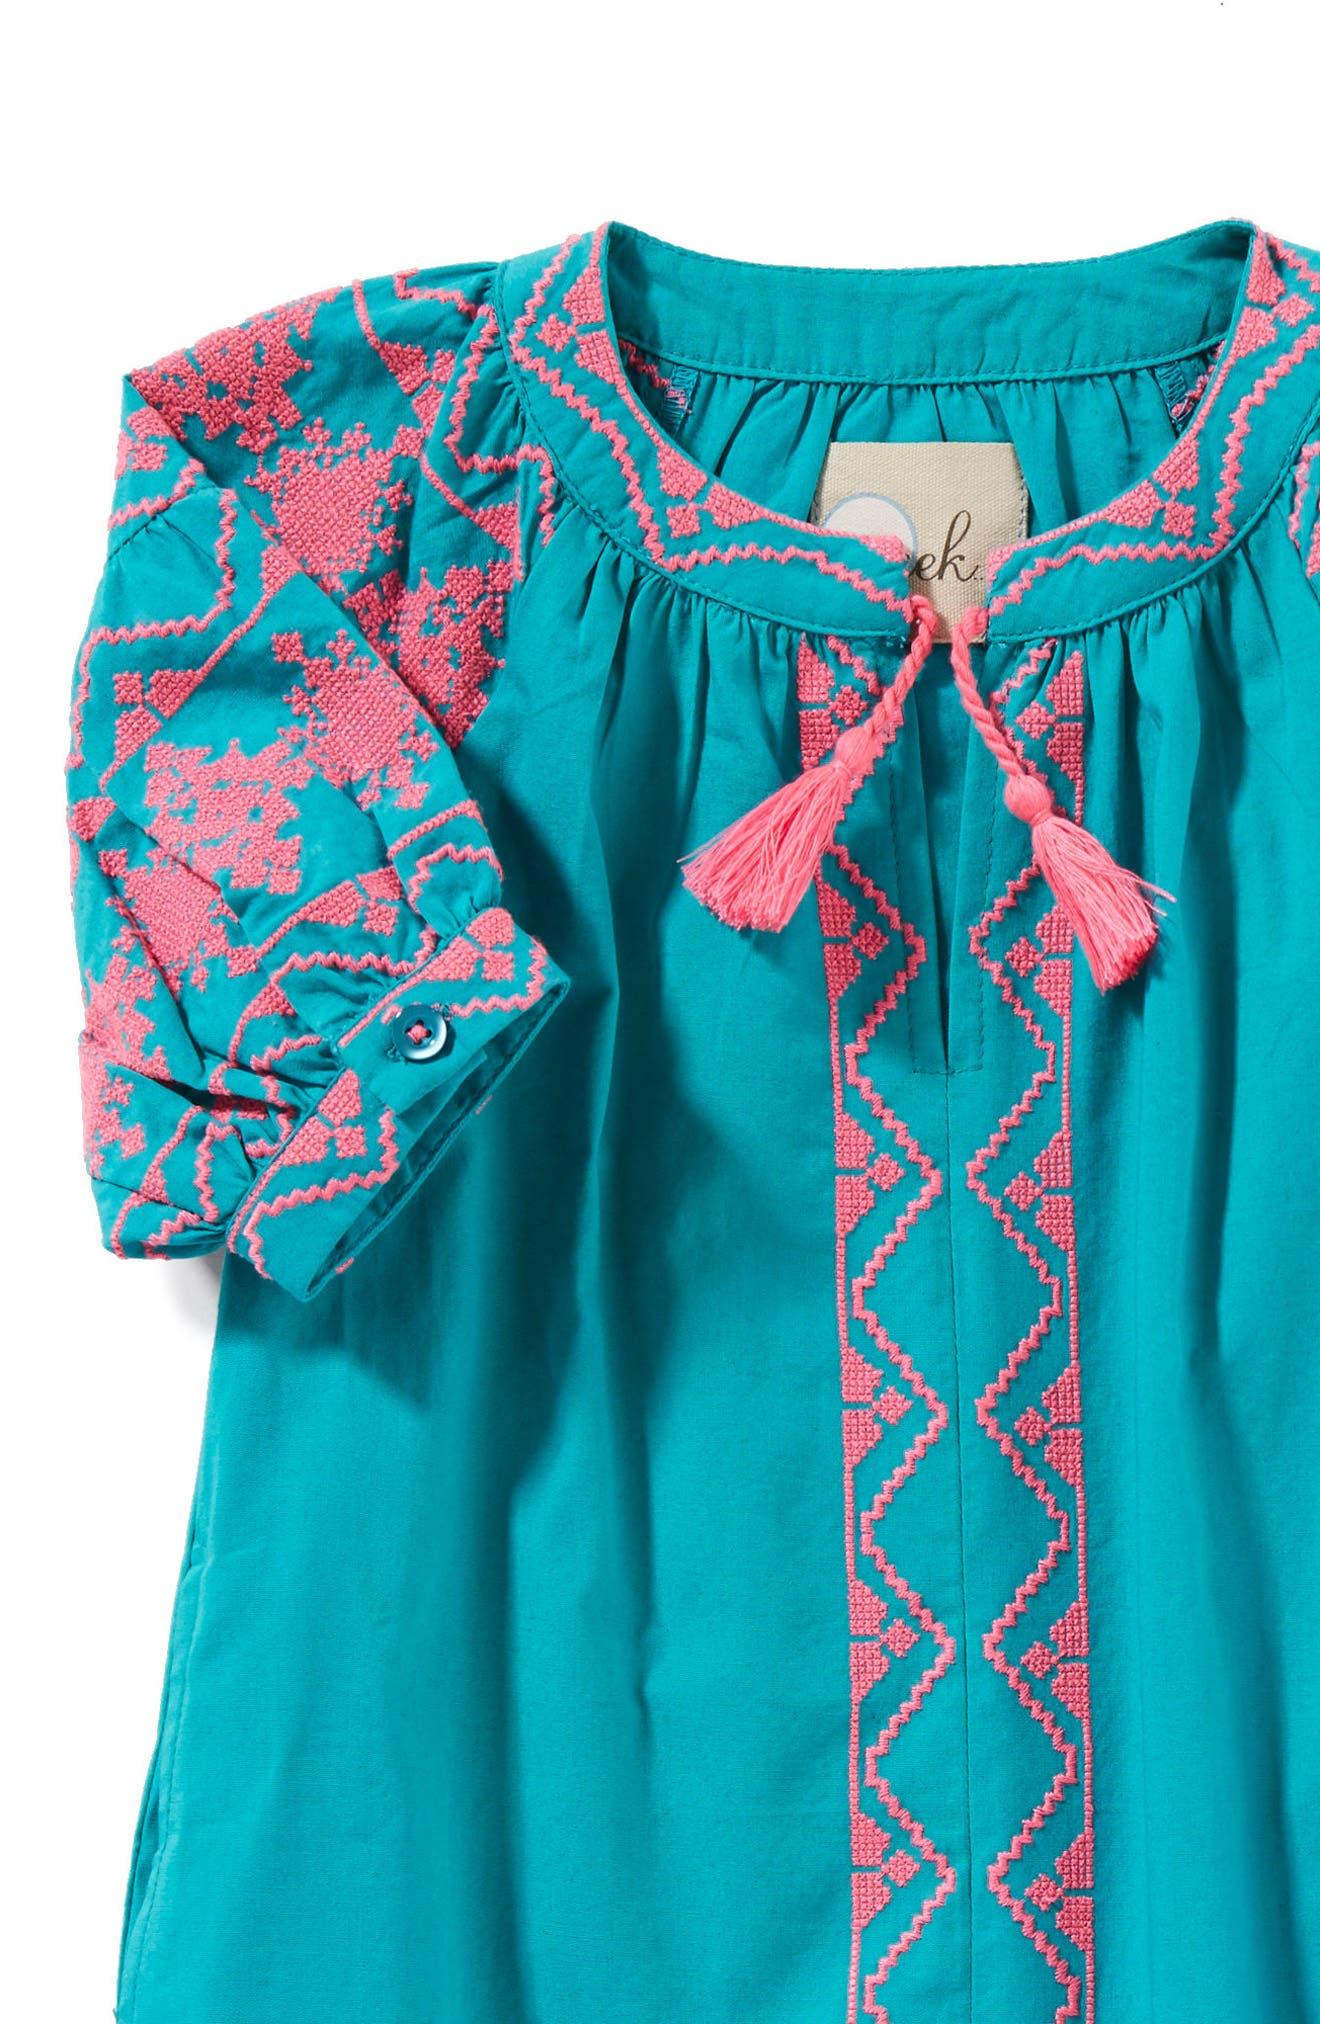 Kellie Embroidered Dress,                             Alternate thumbnail 2, color,                             401